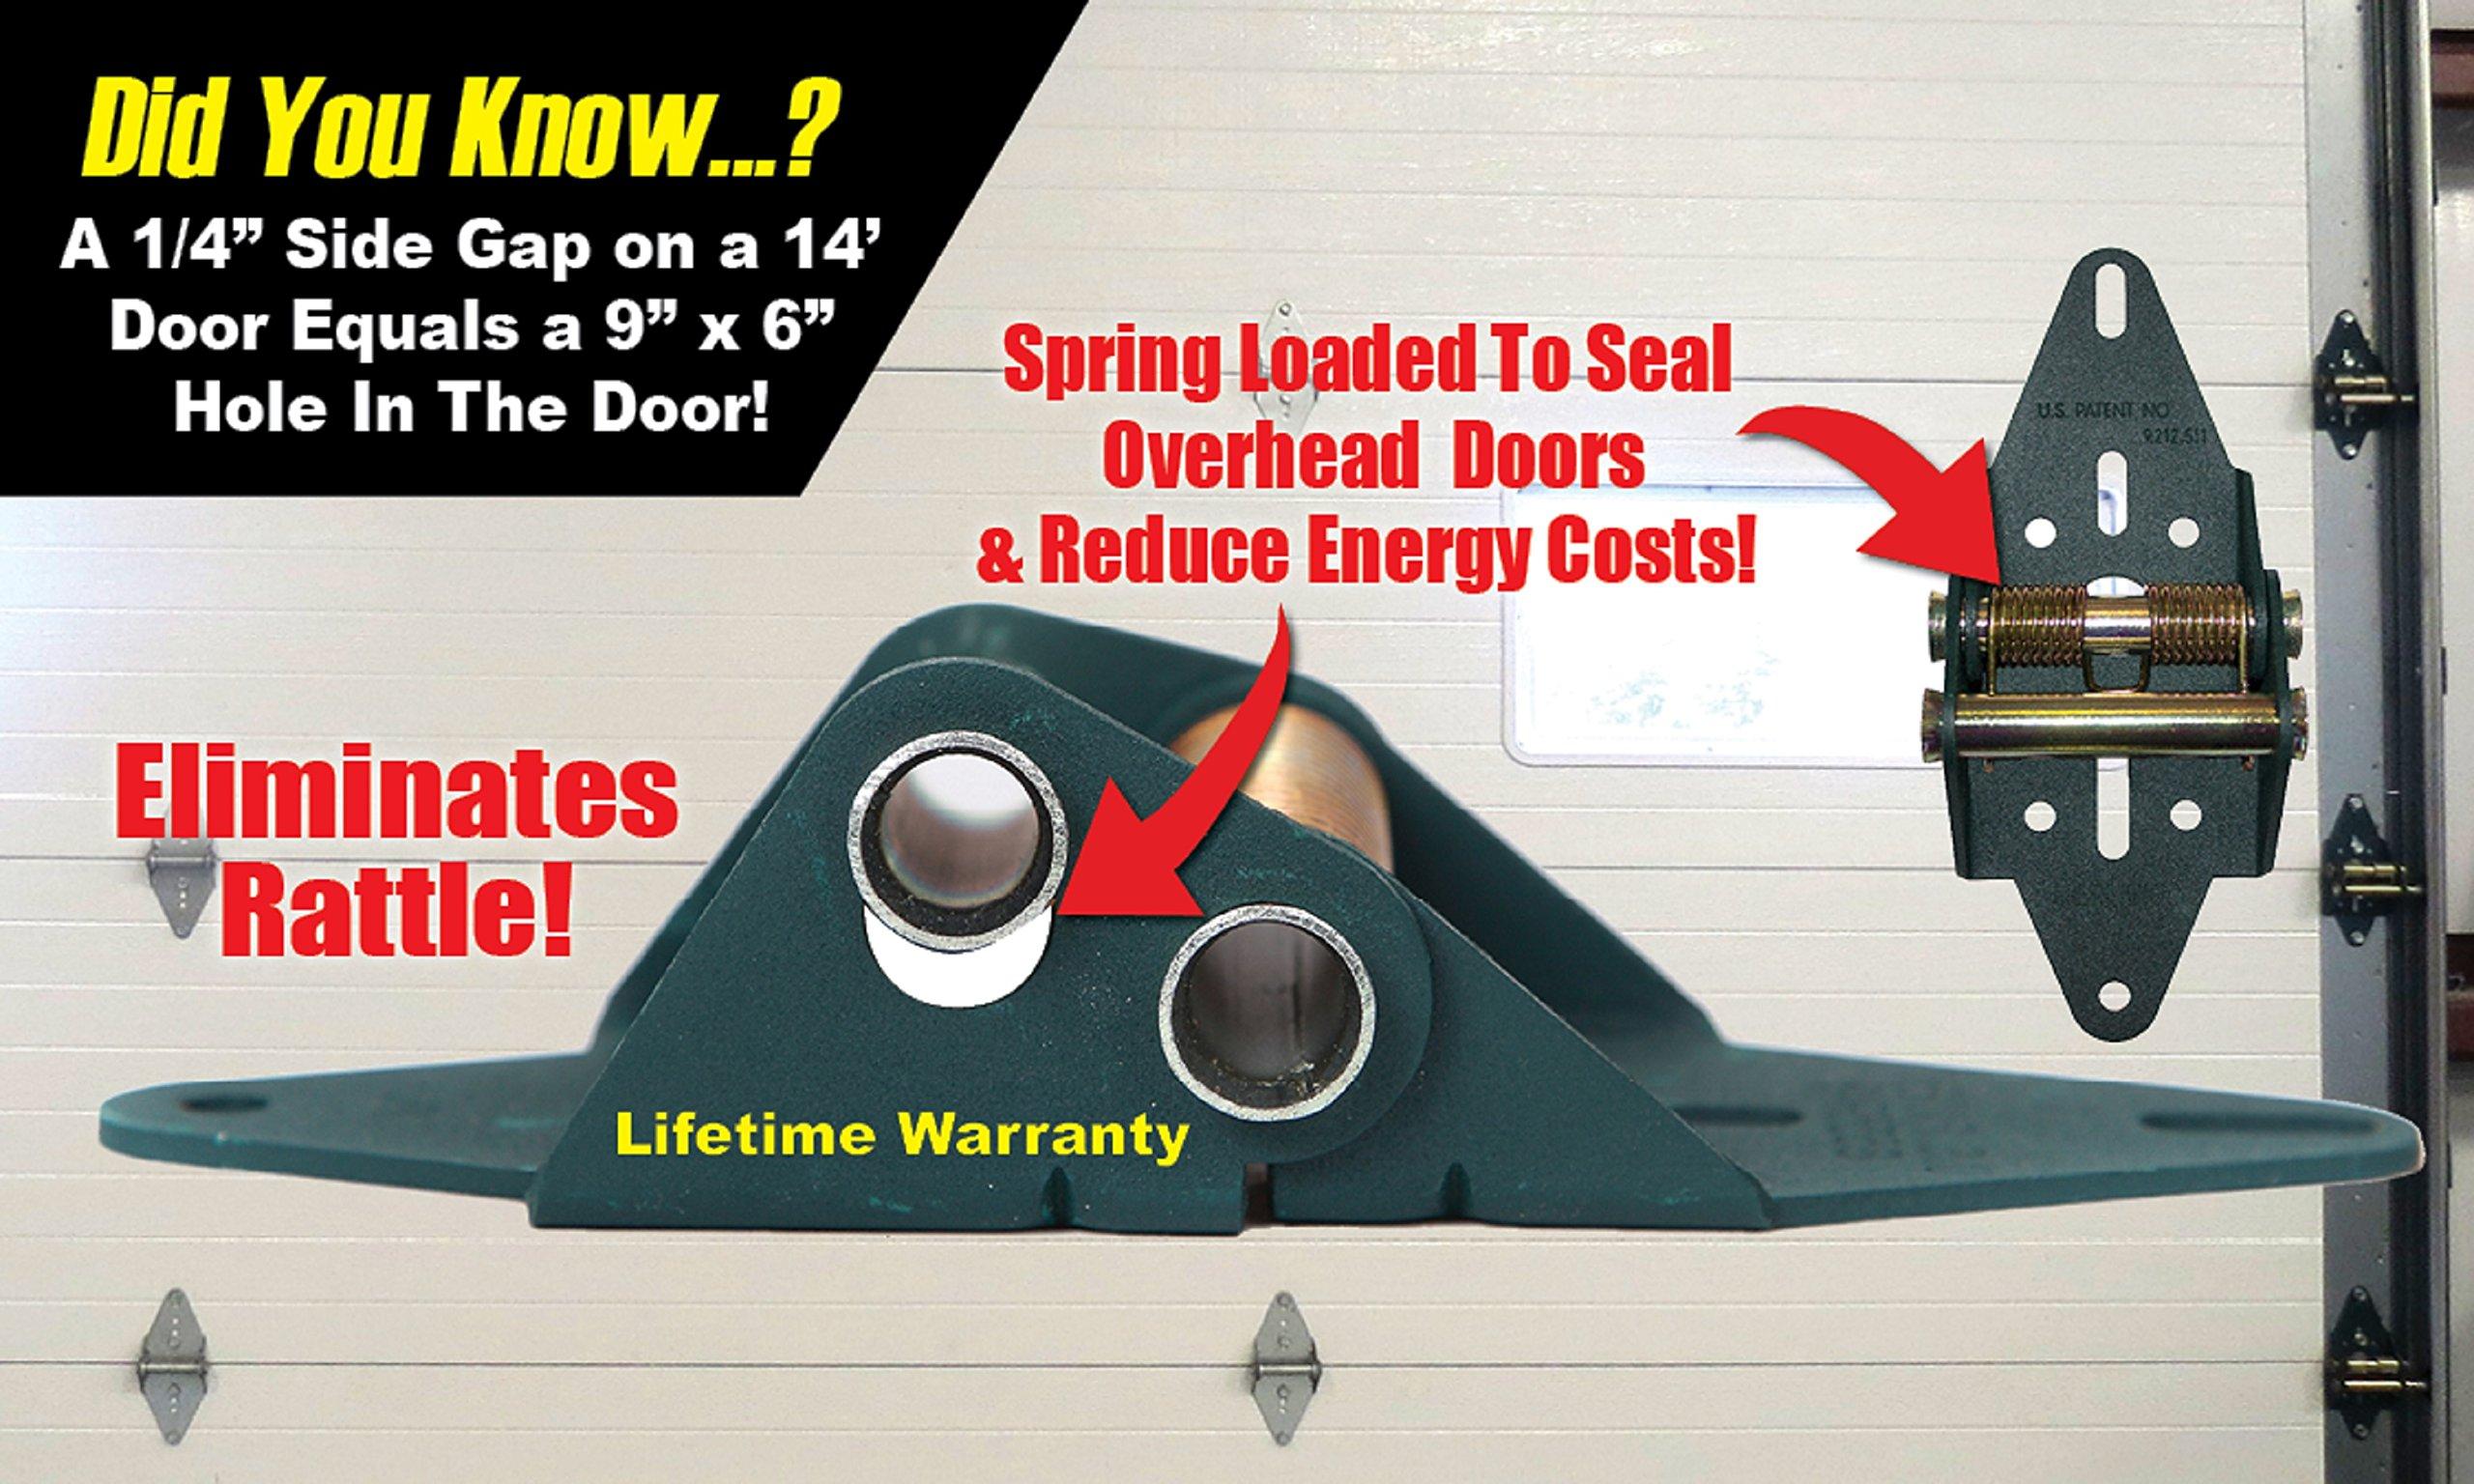 Energy Saving Garage Door Hinge, Residential Set, 4 Panel Door by Green Hinge (Image #9)